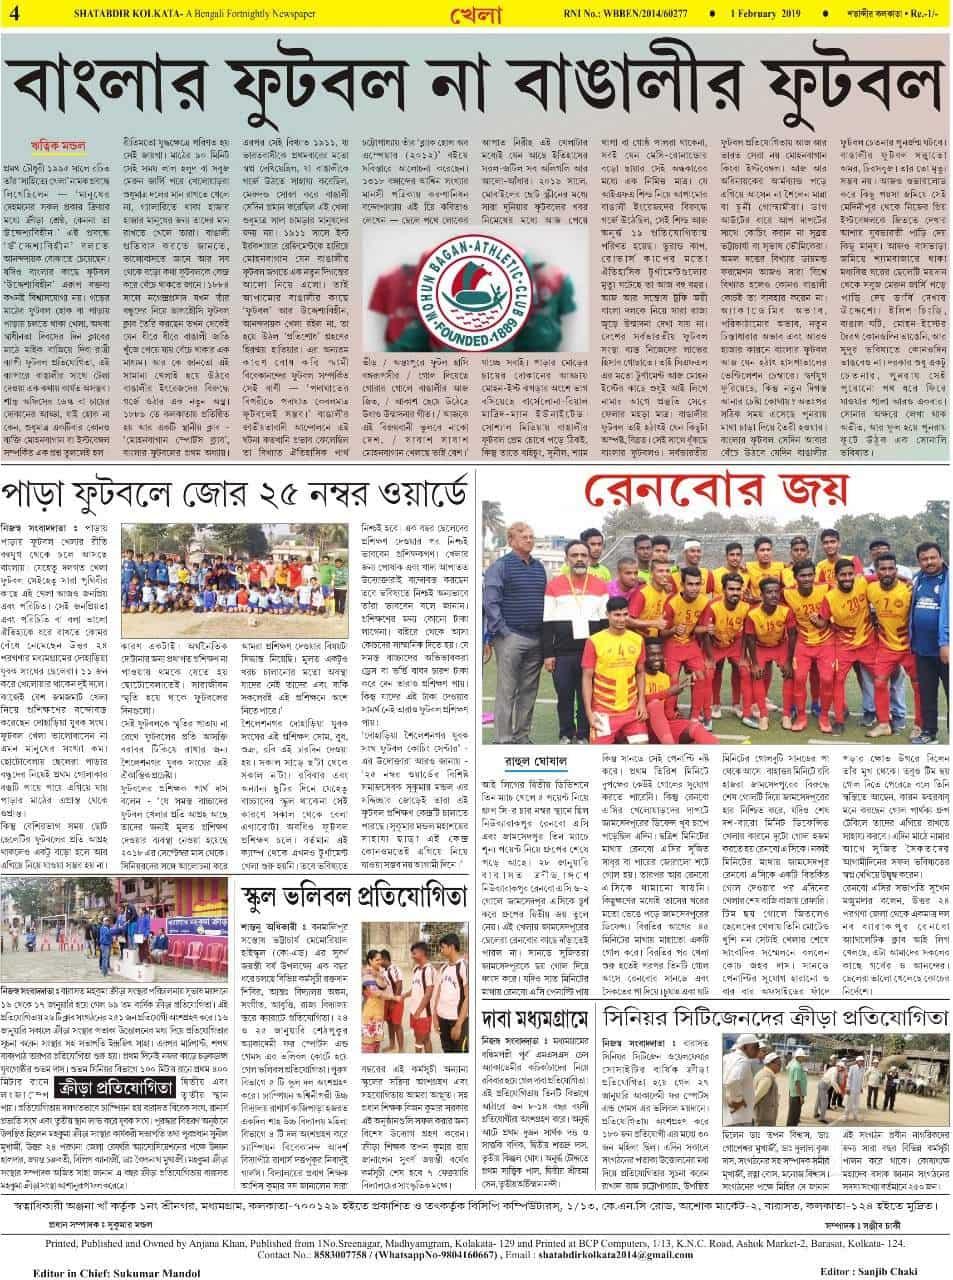 Shatabdir Kolkata, Madhyamgram - Newspaper Publishers in Kolkata